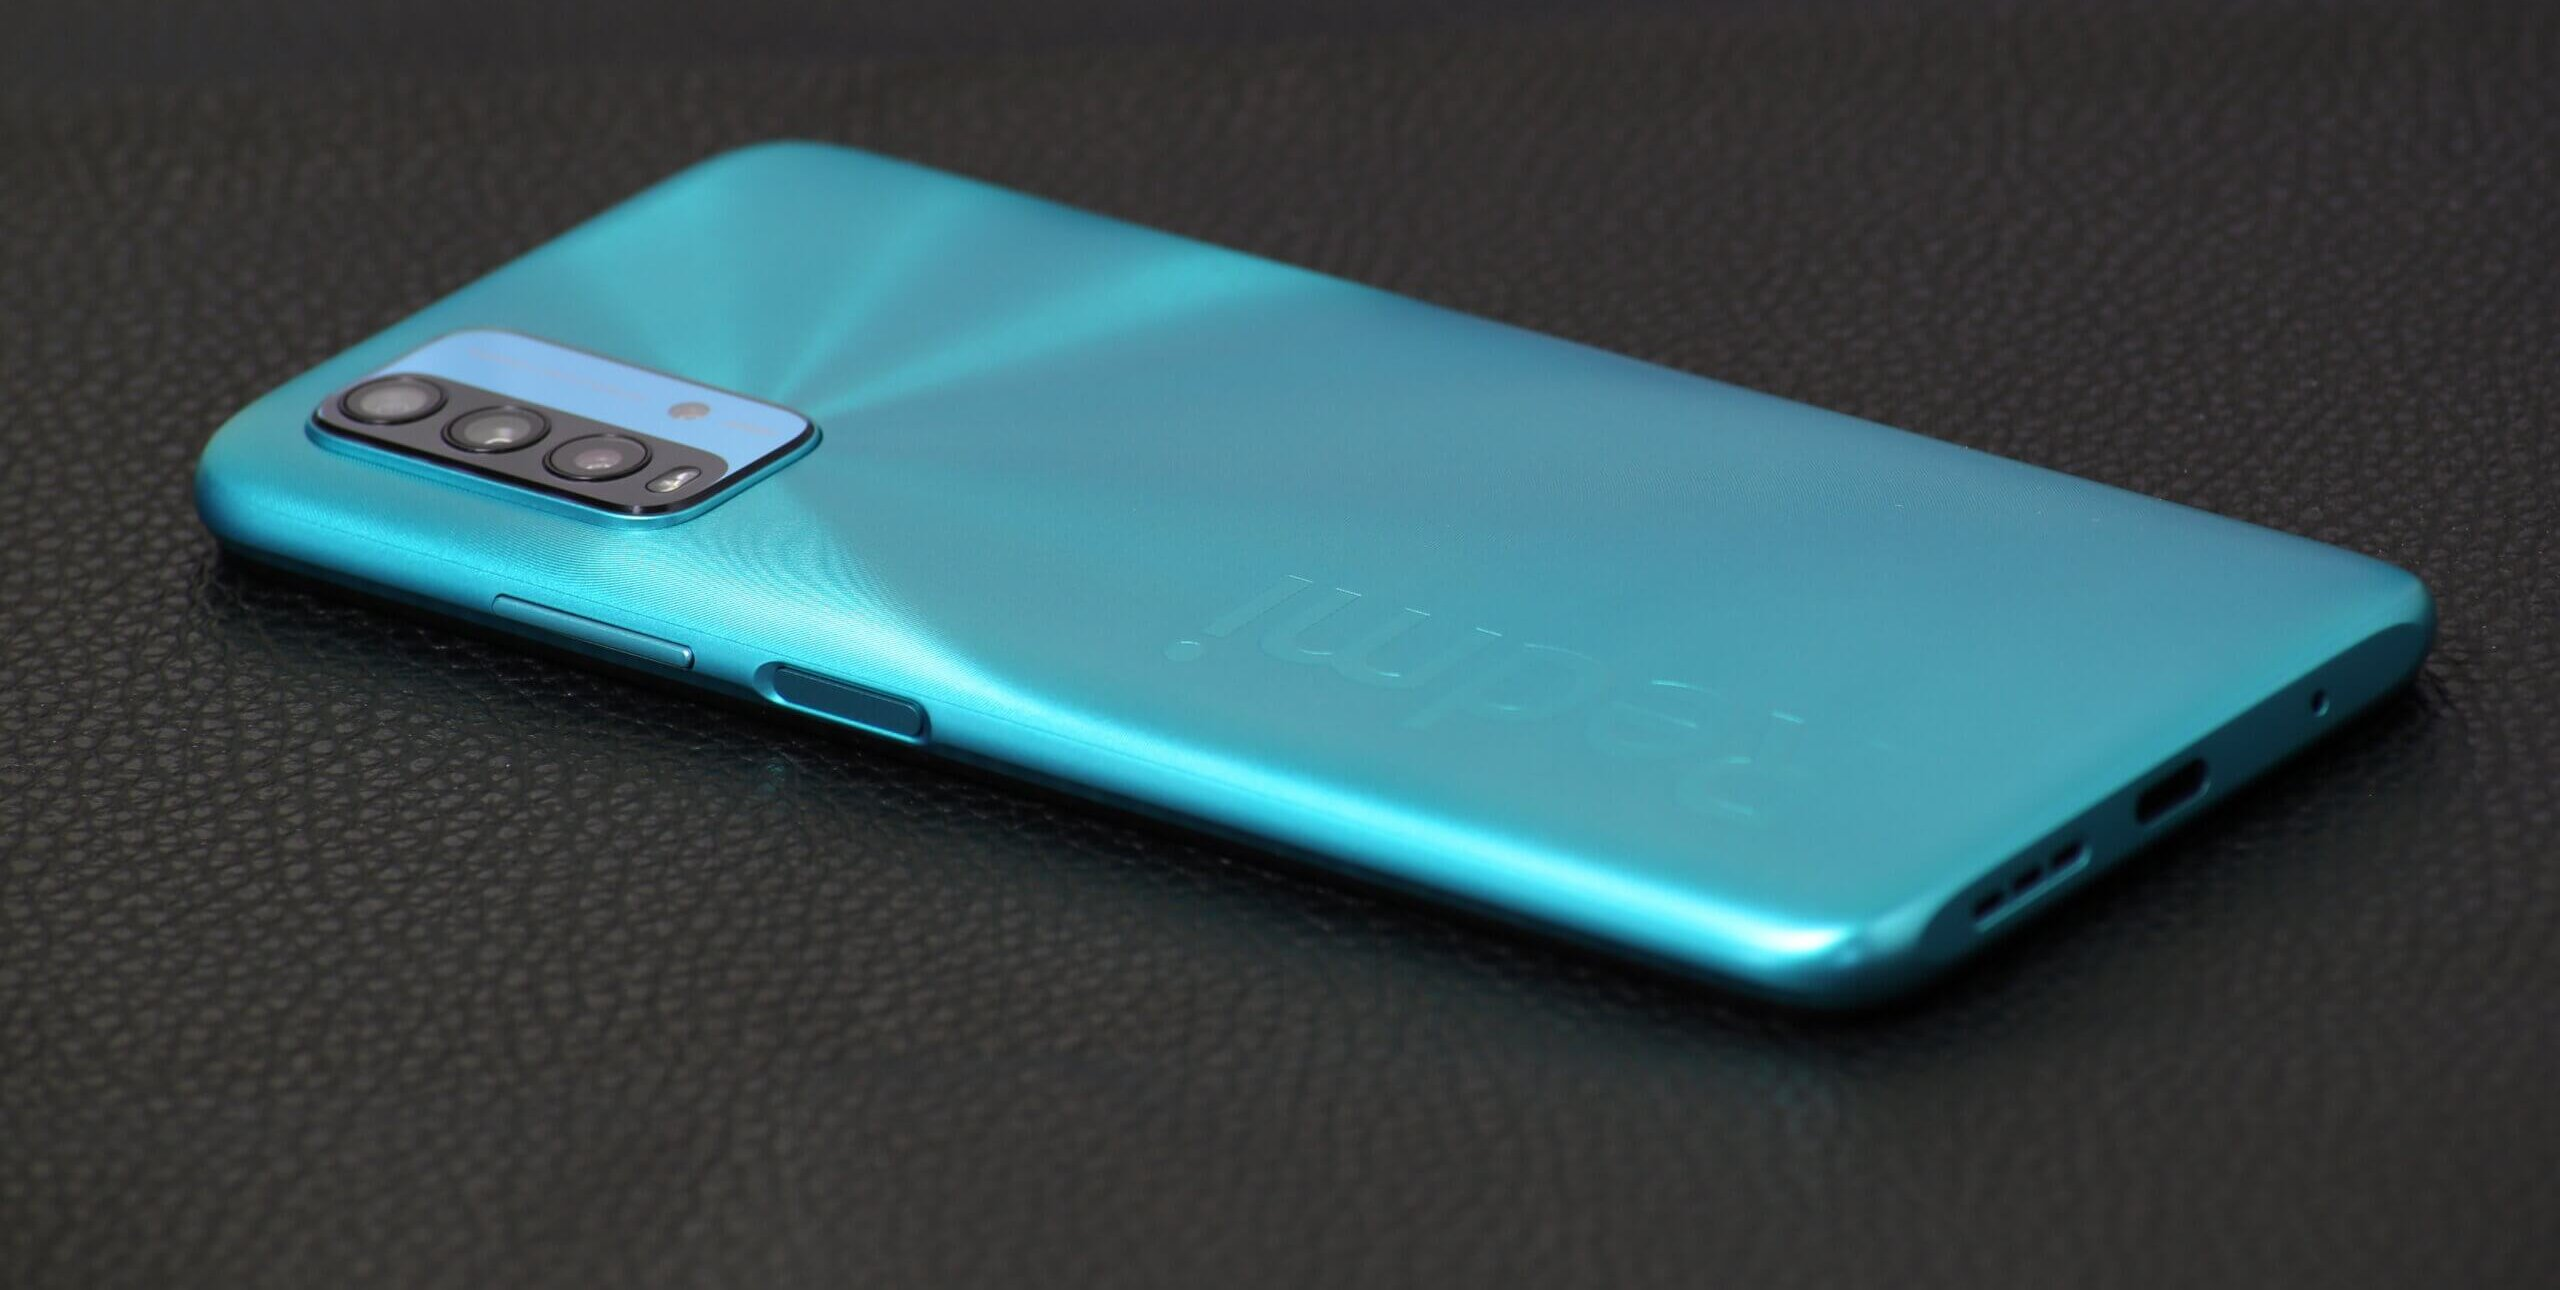 Redmi 9Tはプラスチック素材だがアルミニウムと間違えてしまいそうな高い質感